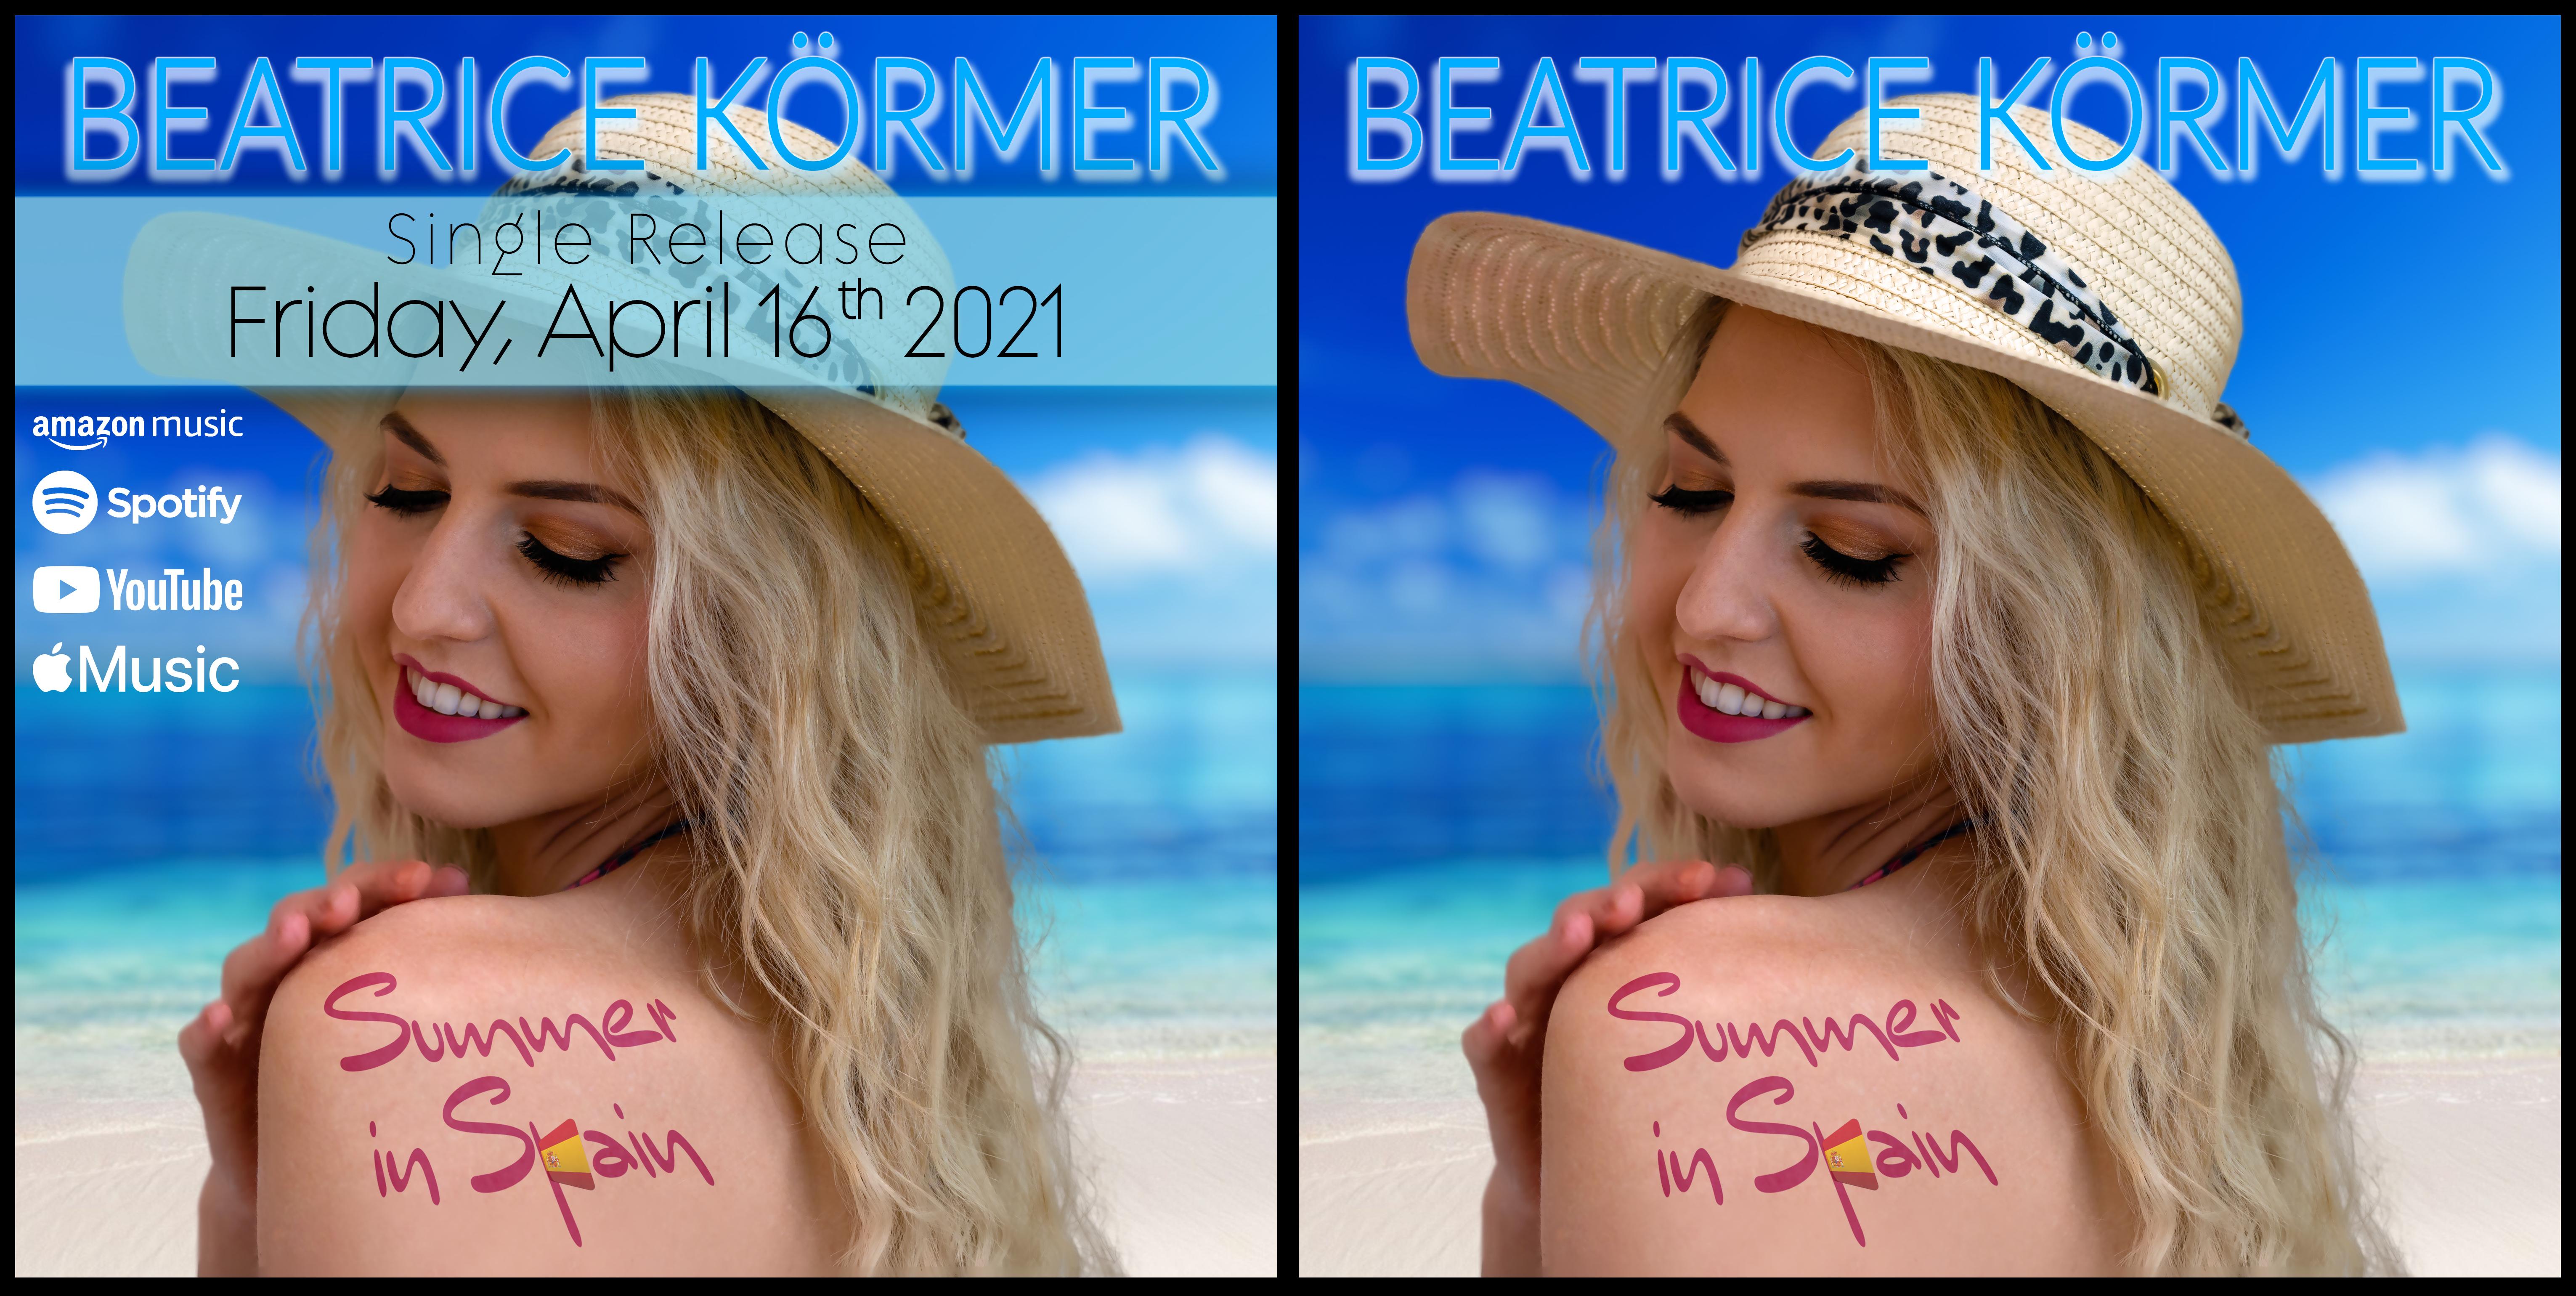 BEATRICE KÖRMER Summer in Spain - Vorankündigung & Cover